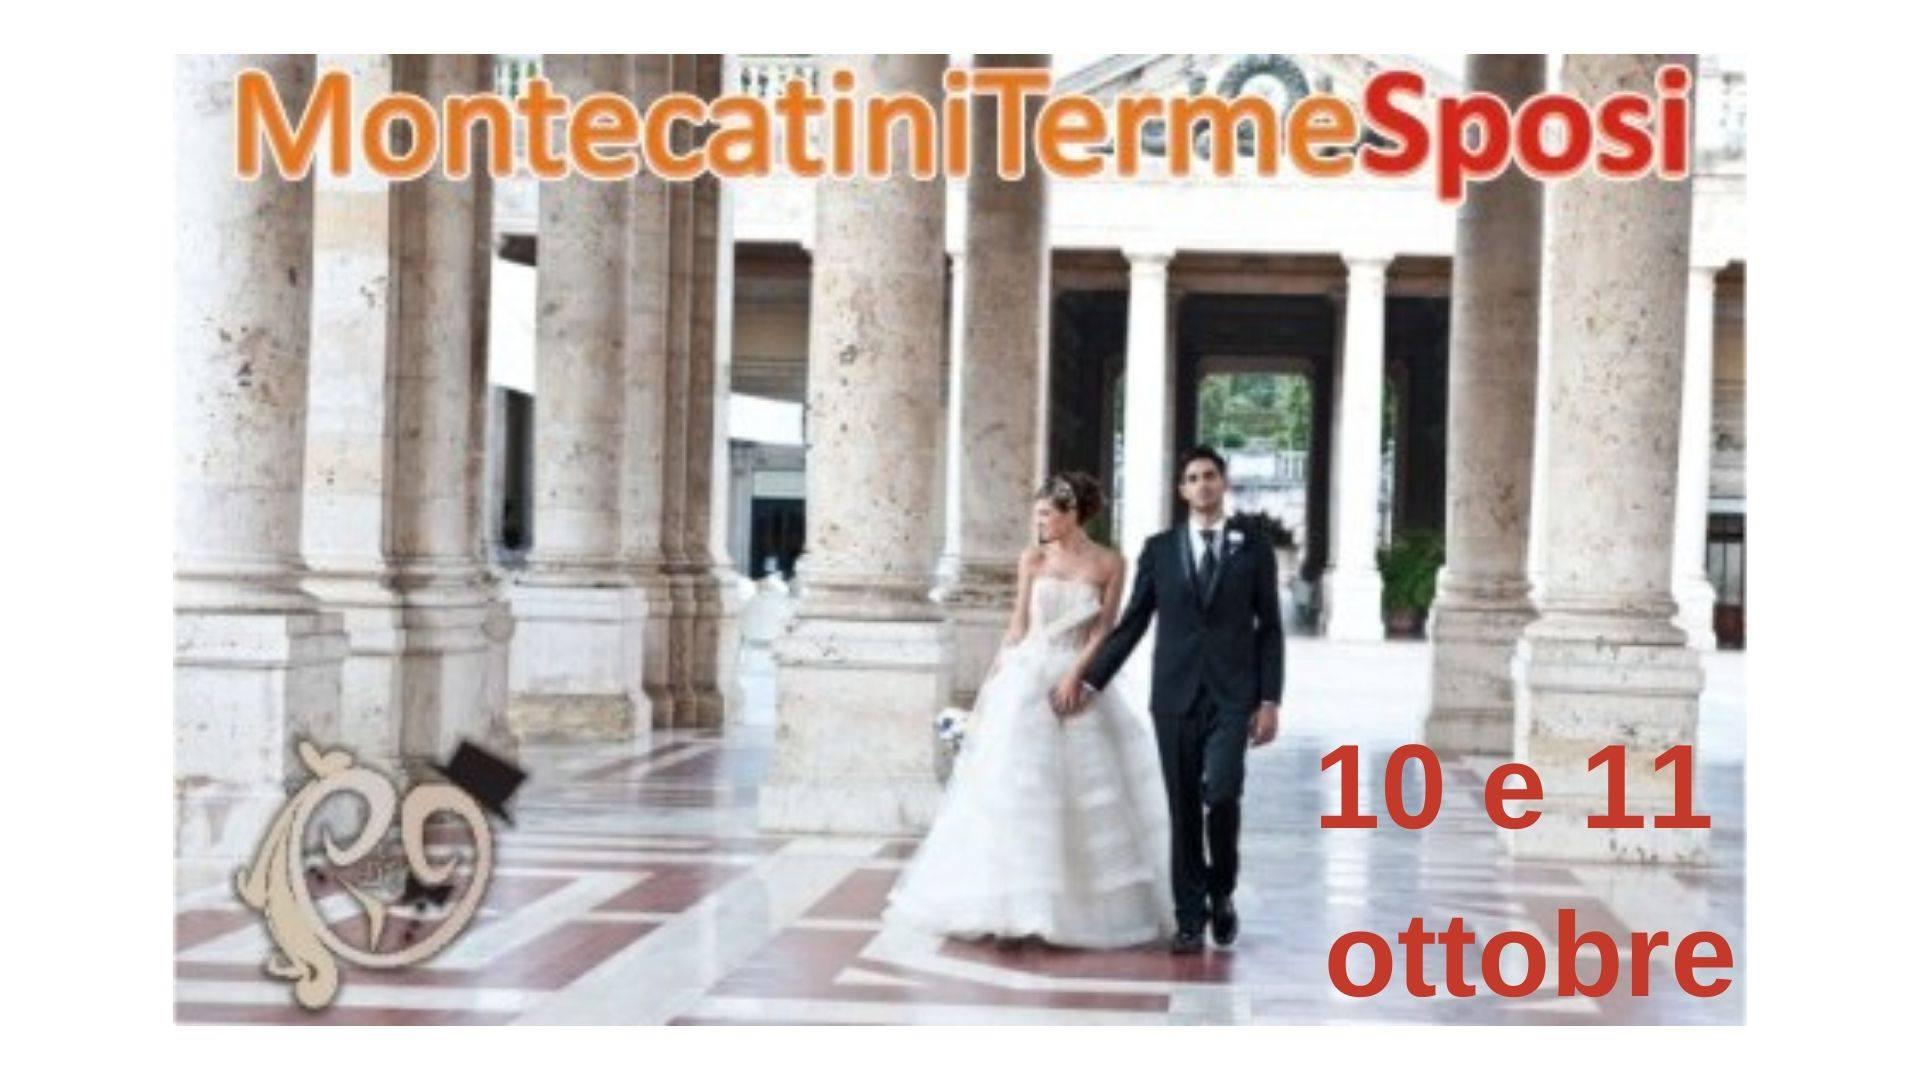 Montecatini Terme Sposi